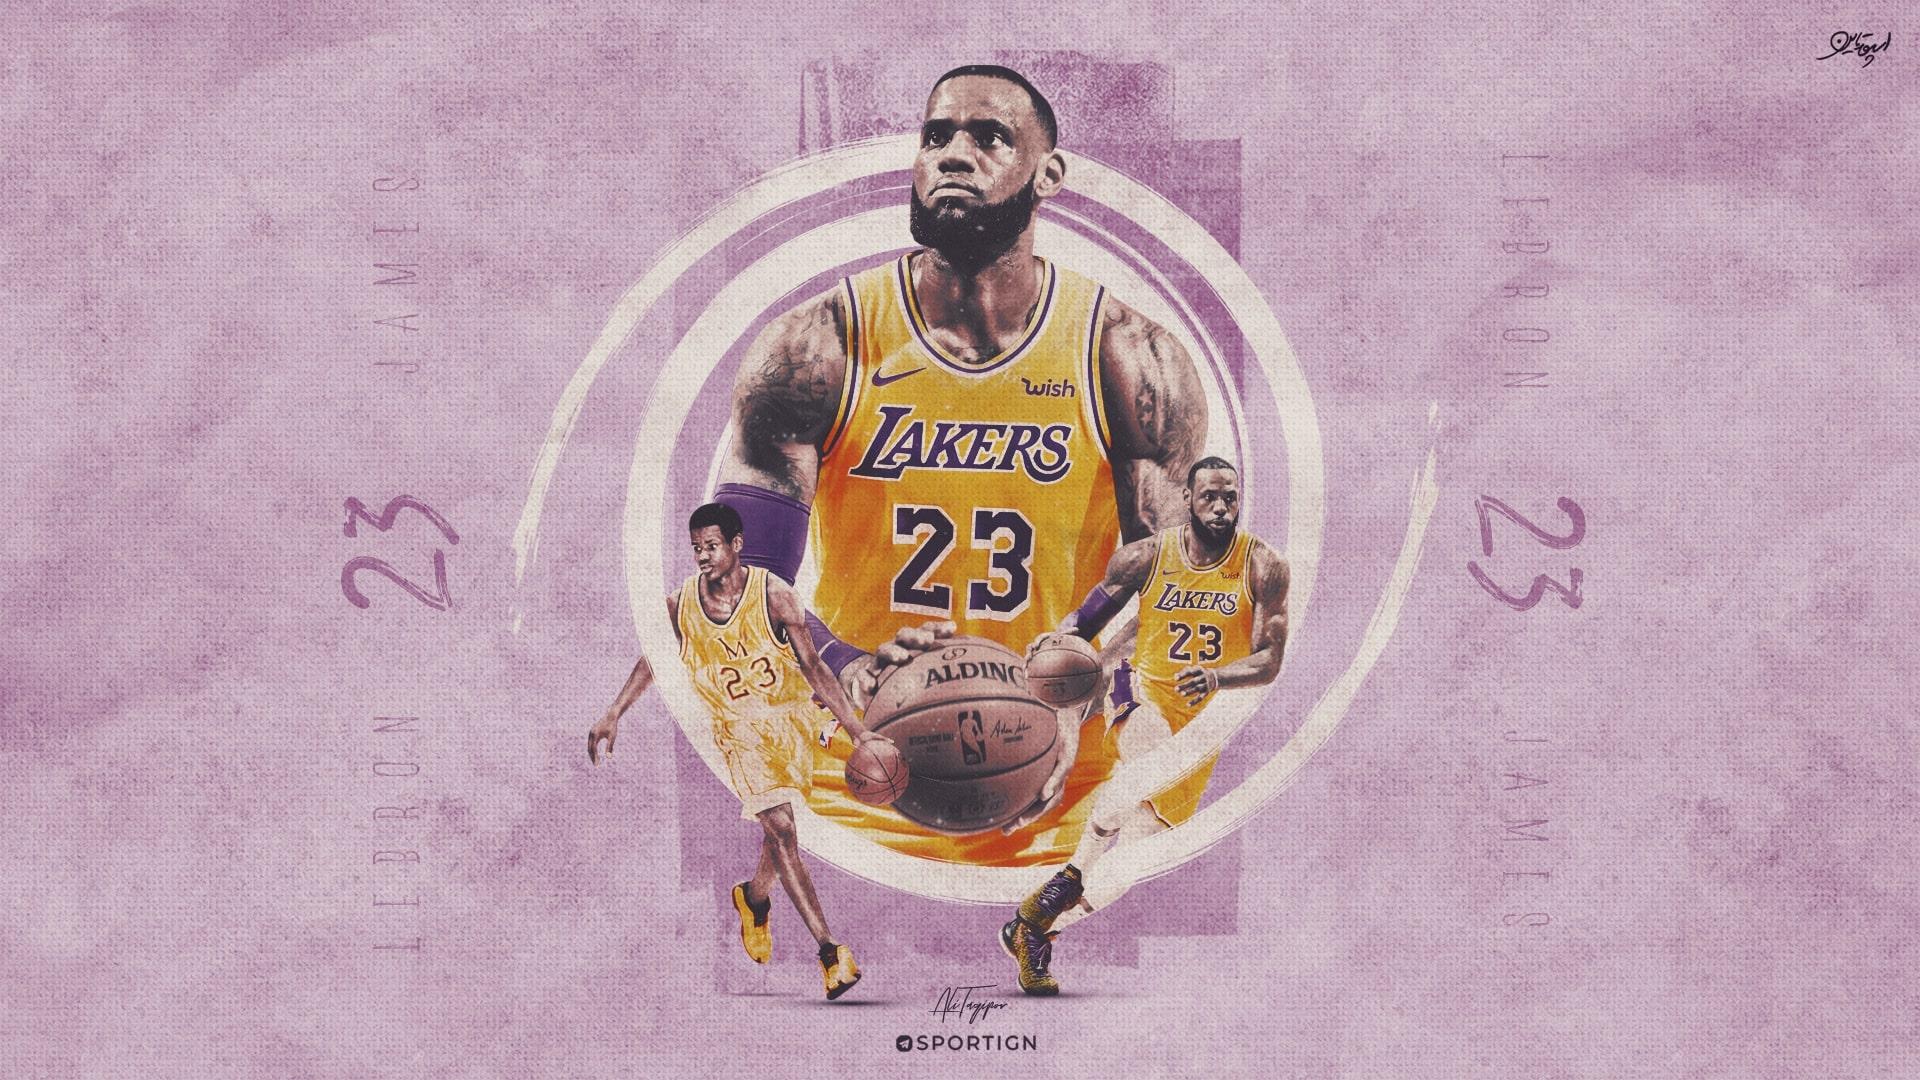 Lebron James Desktop Wallpaper Lakers 2259451 Hd Wallpaper Backgrounds Download